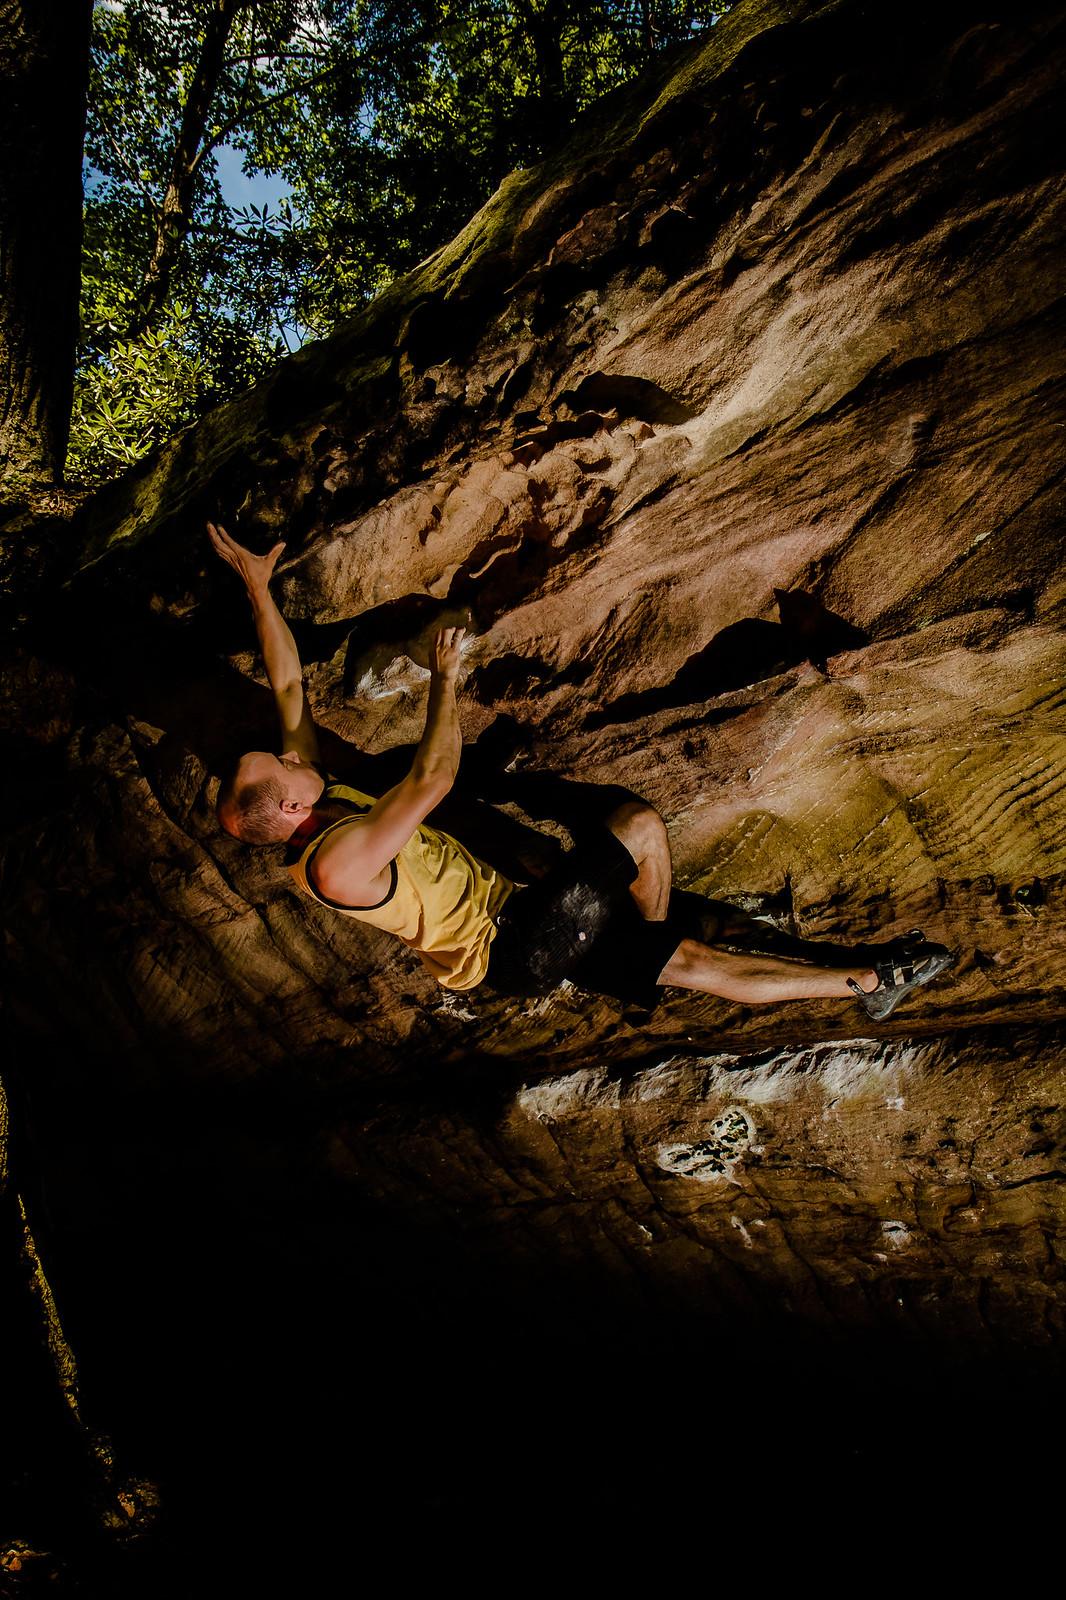 Ben sending Tomb Raider Roof Variartion (v5)